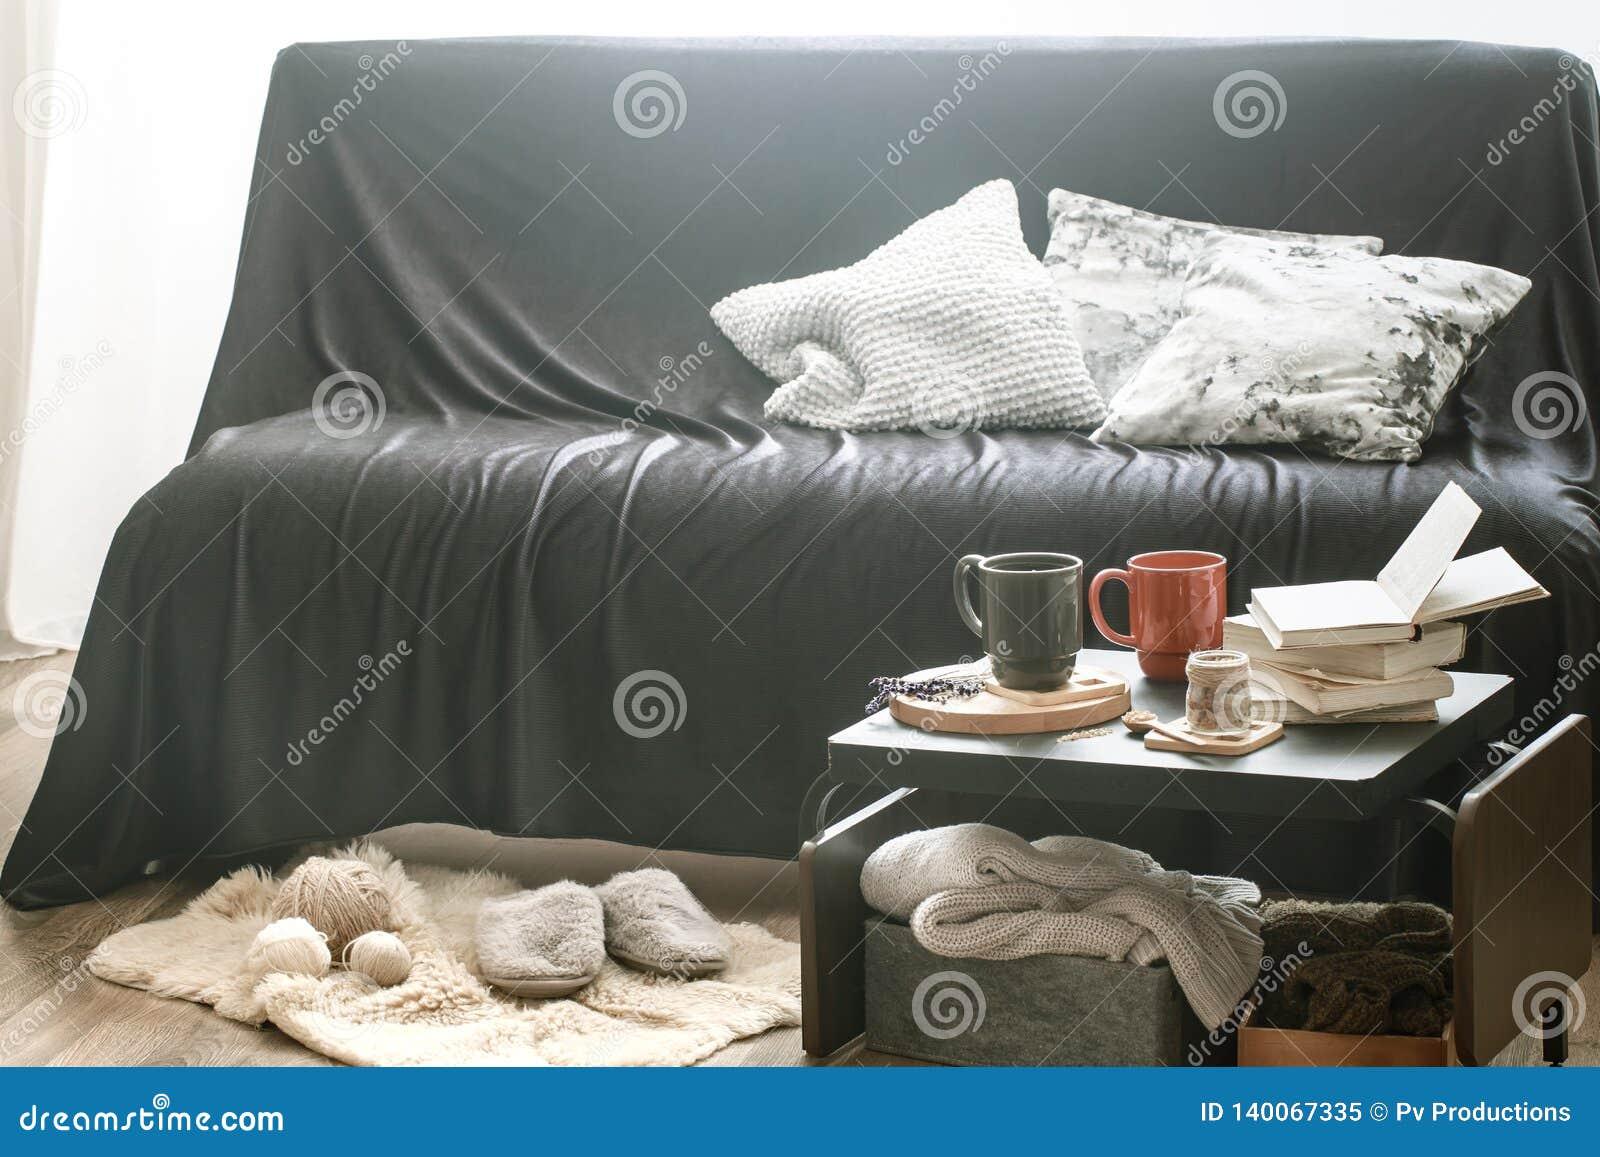 Strange Cozy Home Interior Living Room With Black Sofa Stock Image Beatyapartments Chair Design Images Beatyapartmentscom